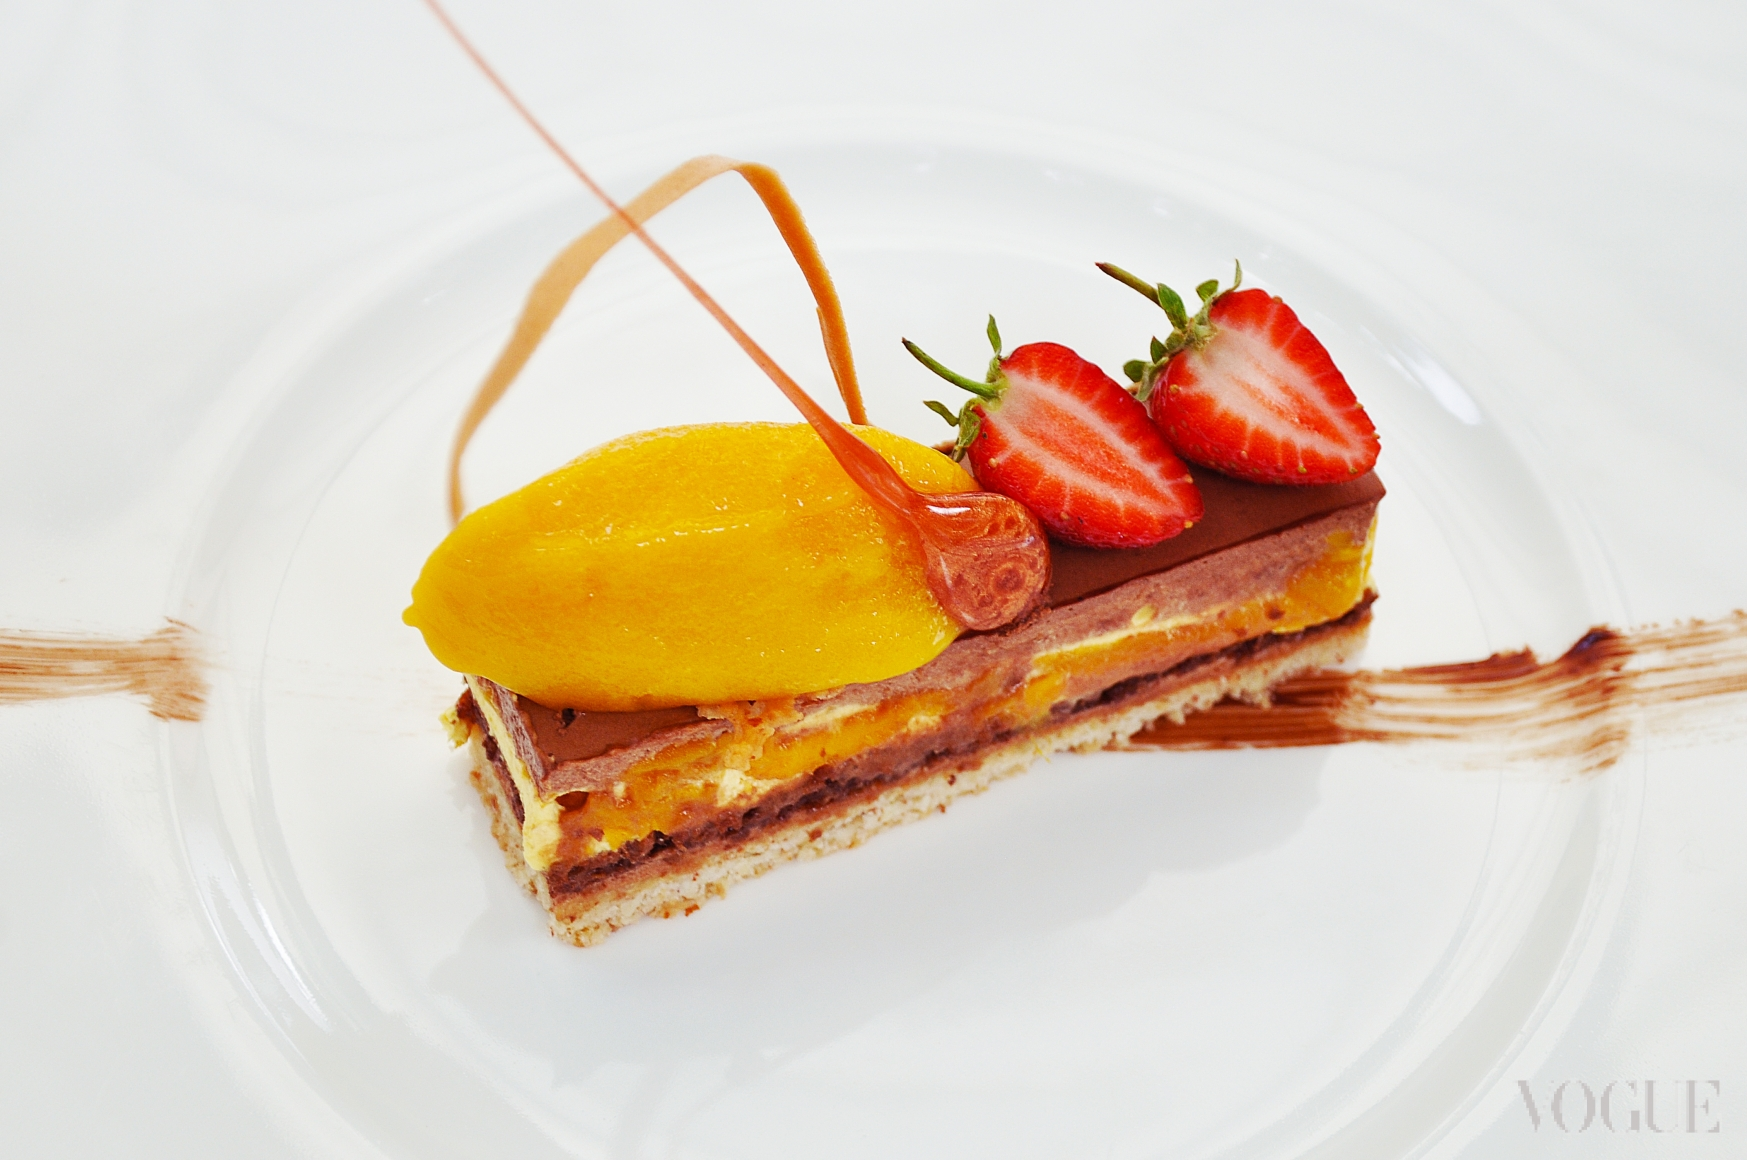 Passionata с мангово-маракуевым сорбетом